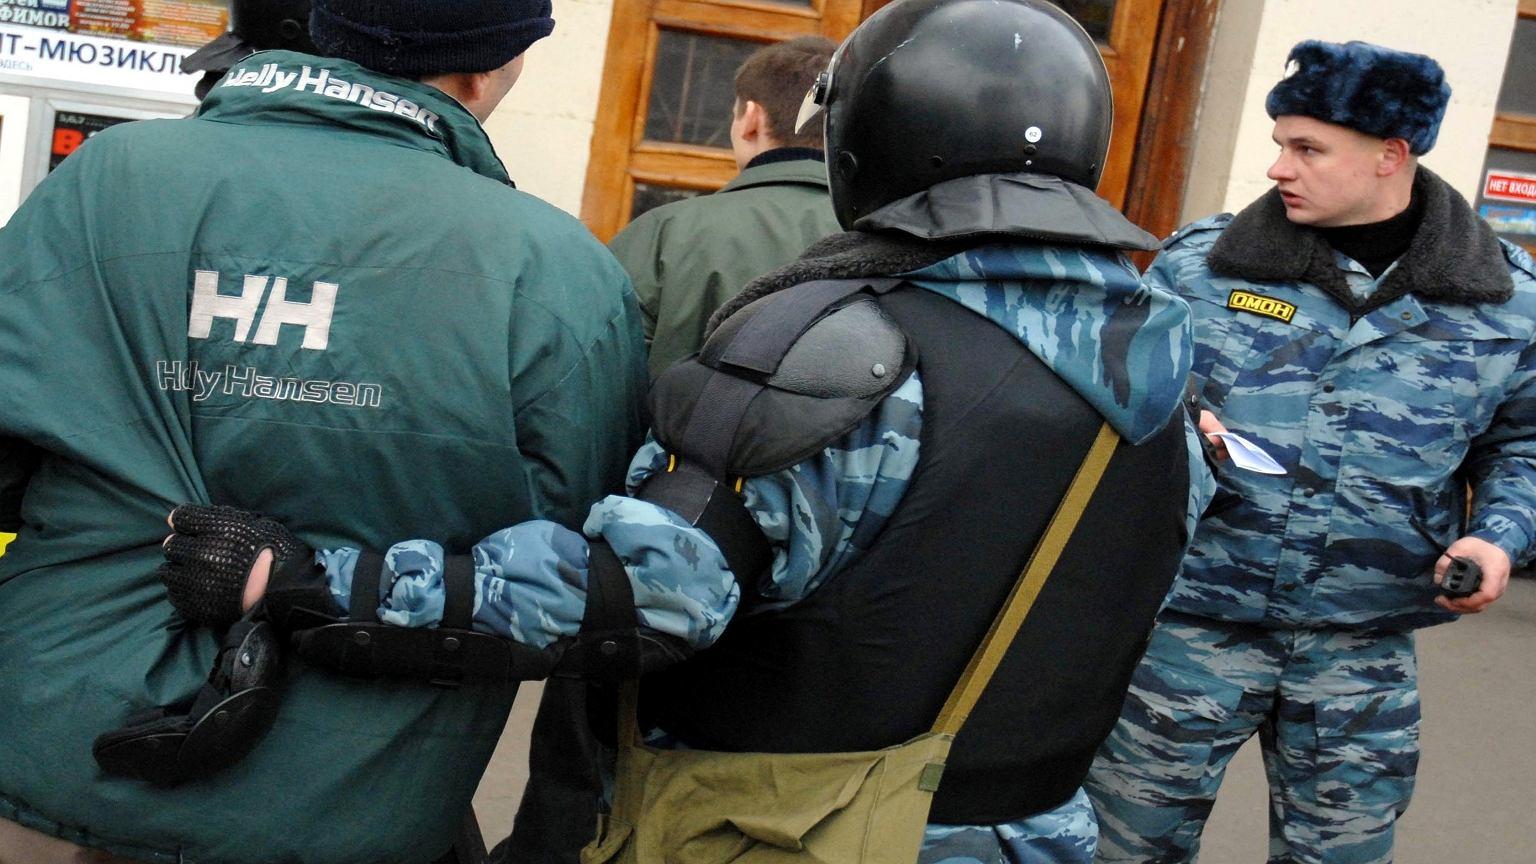 Rosyjska milicja